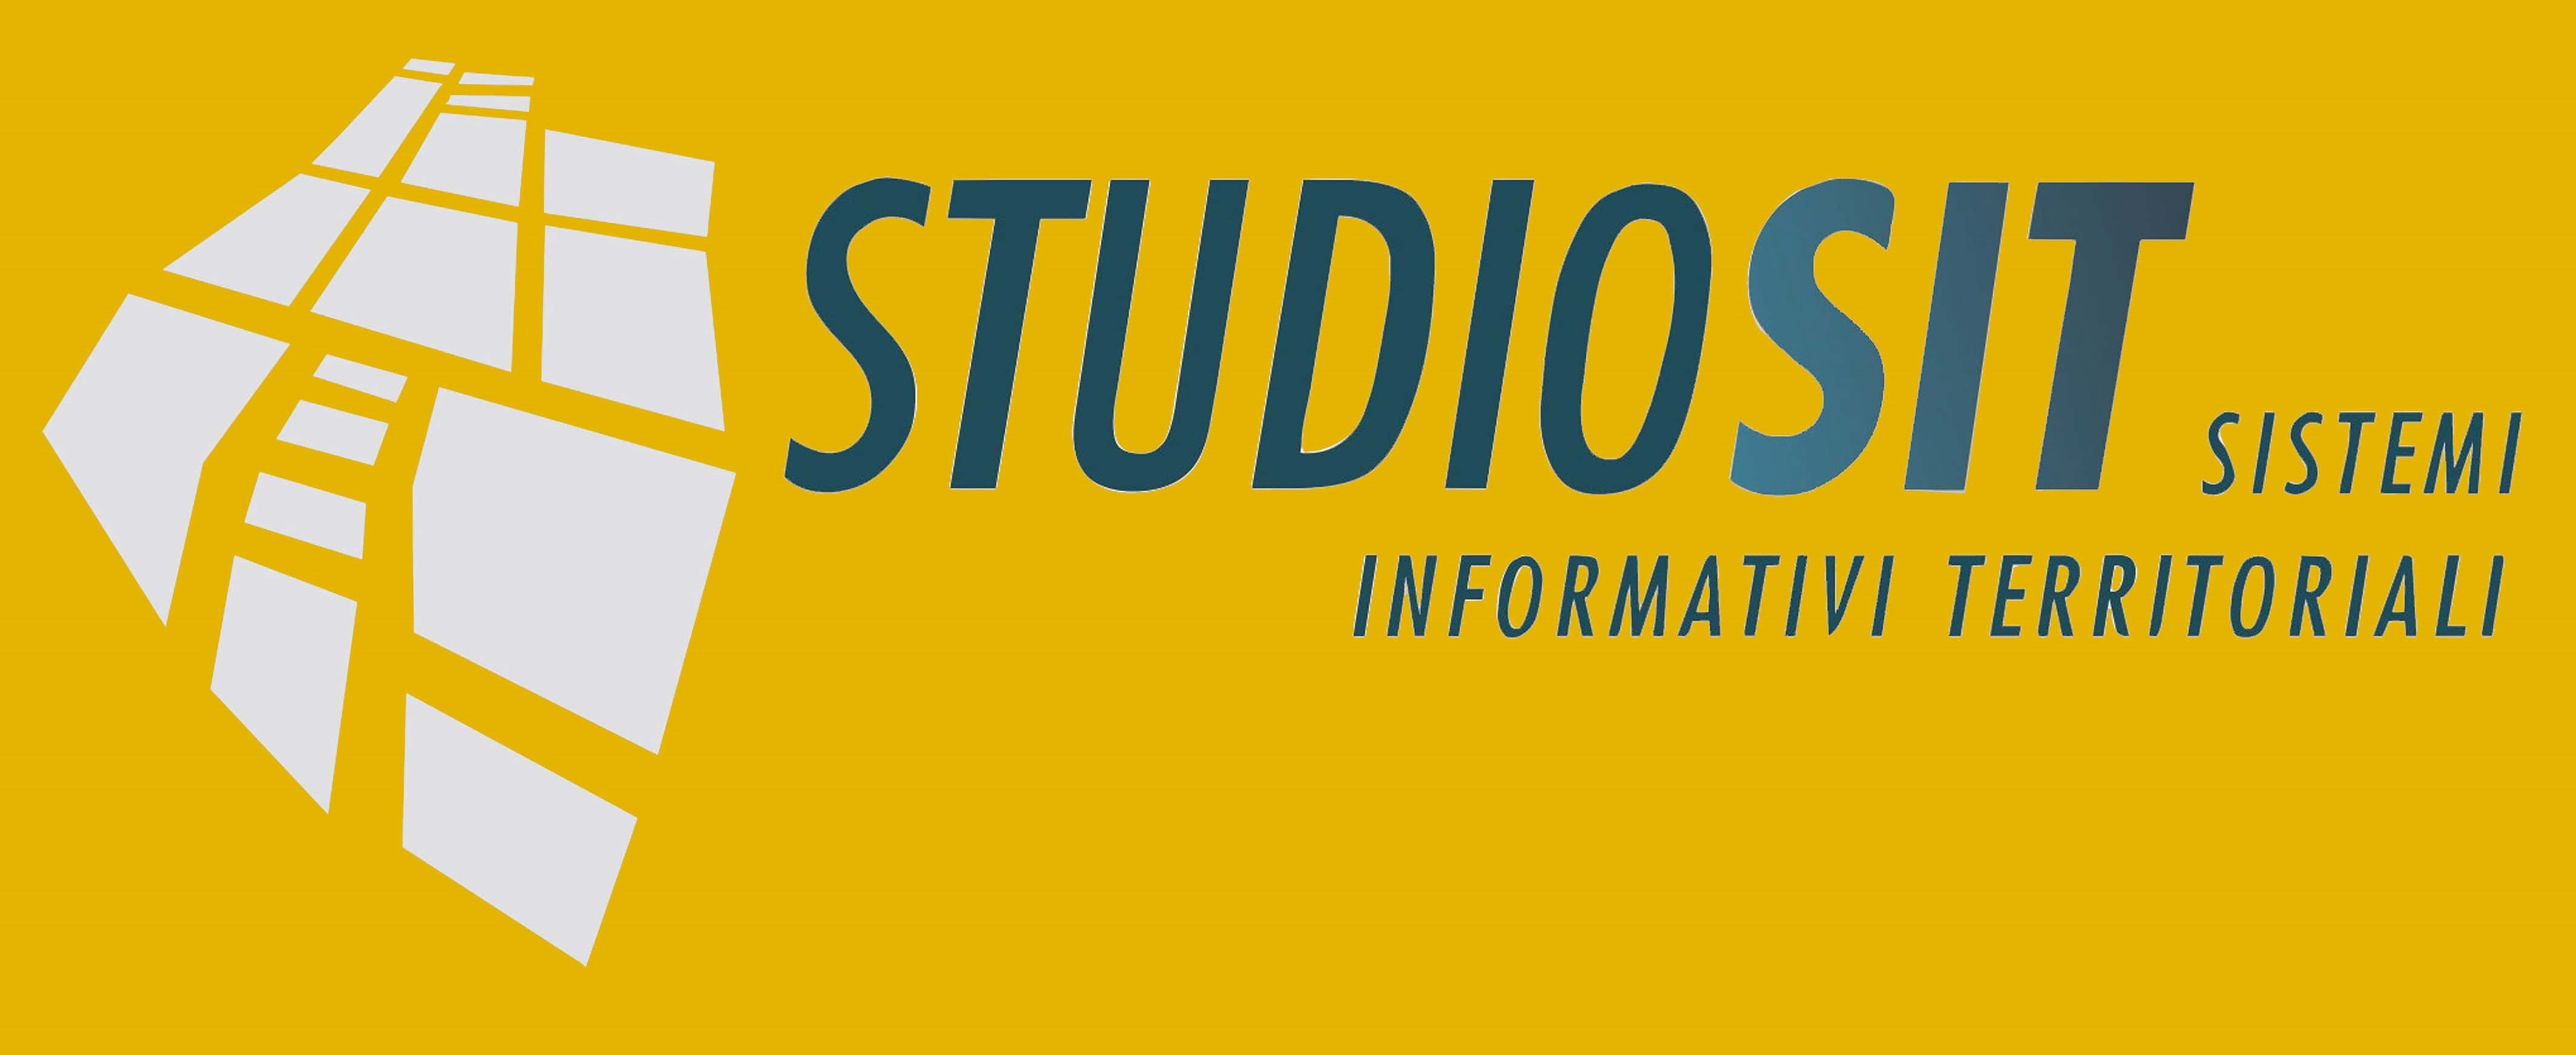 Studio SIT